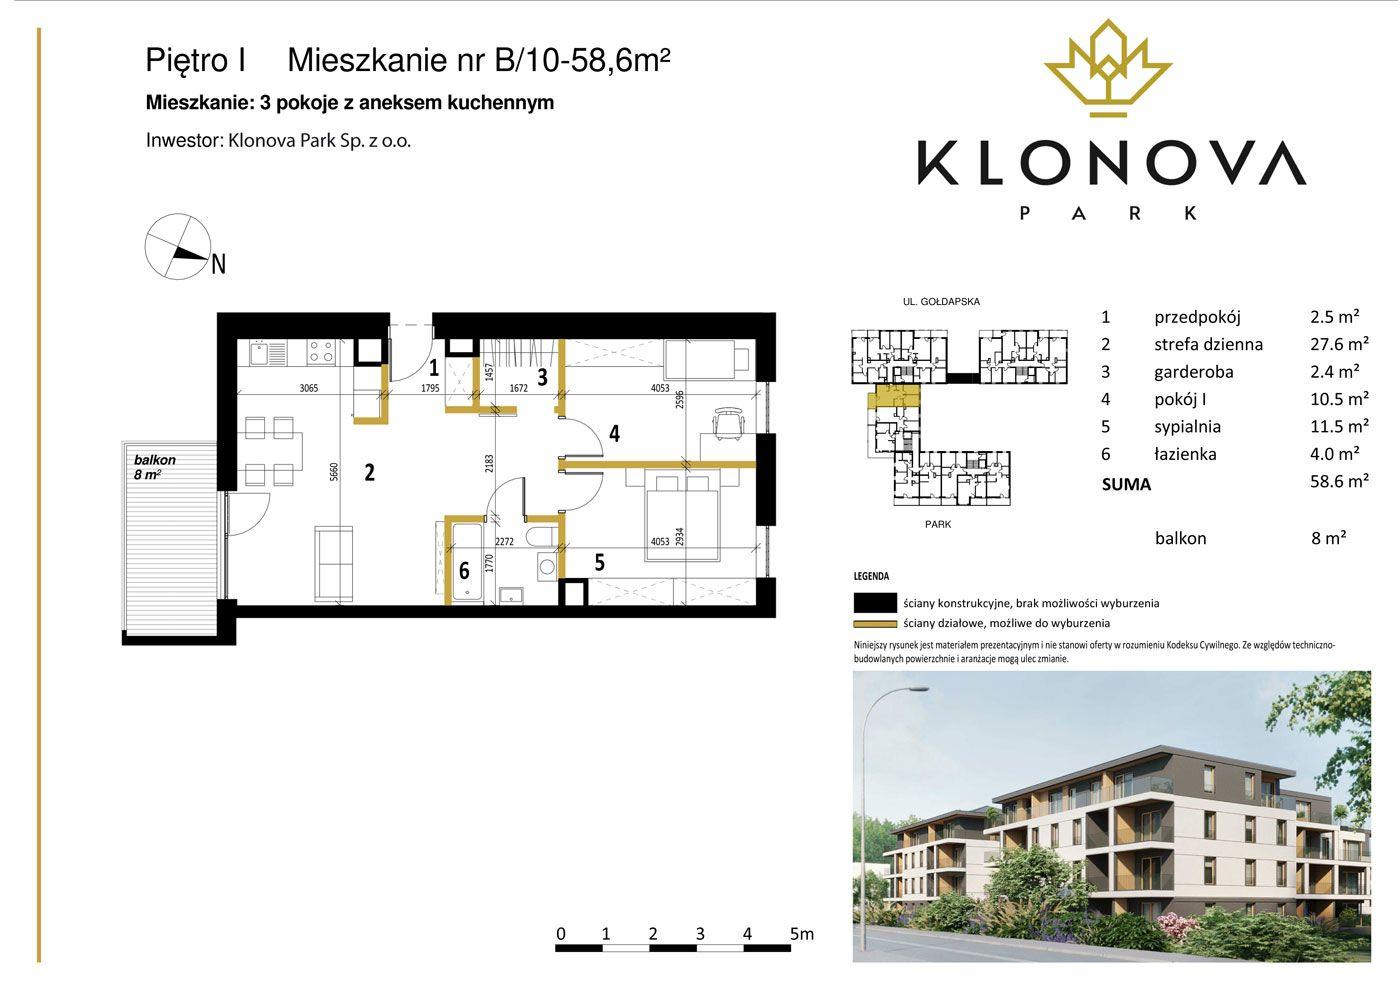 Apartamenty Klonova Park - Plan mieszkania B/10